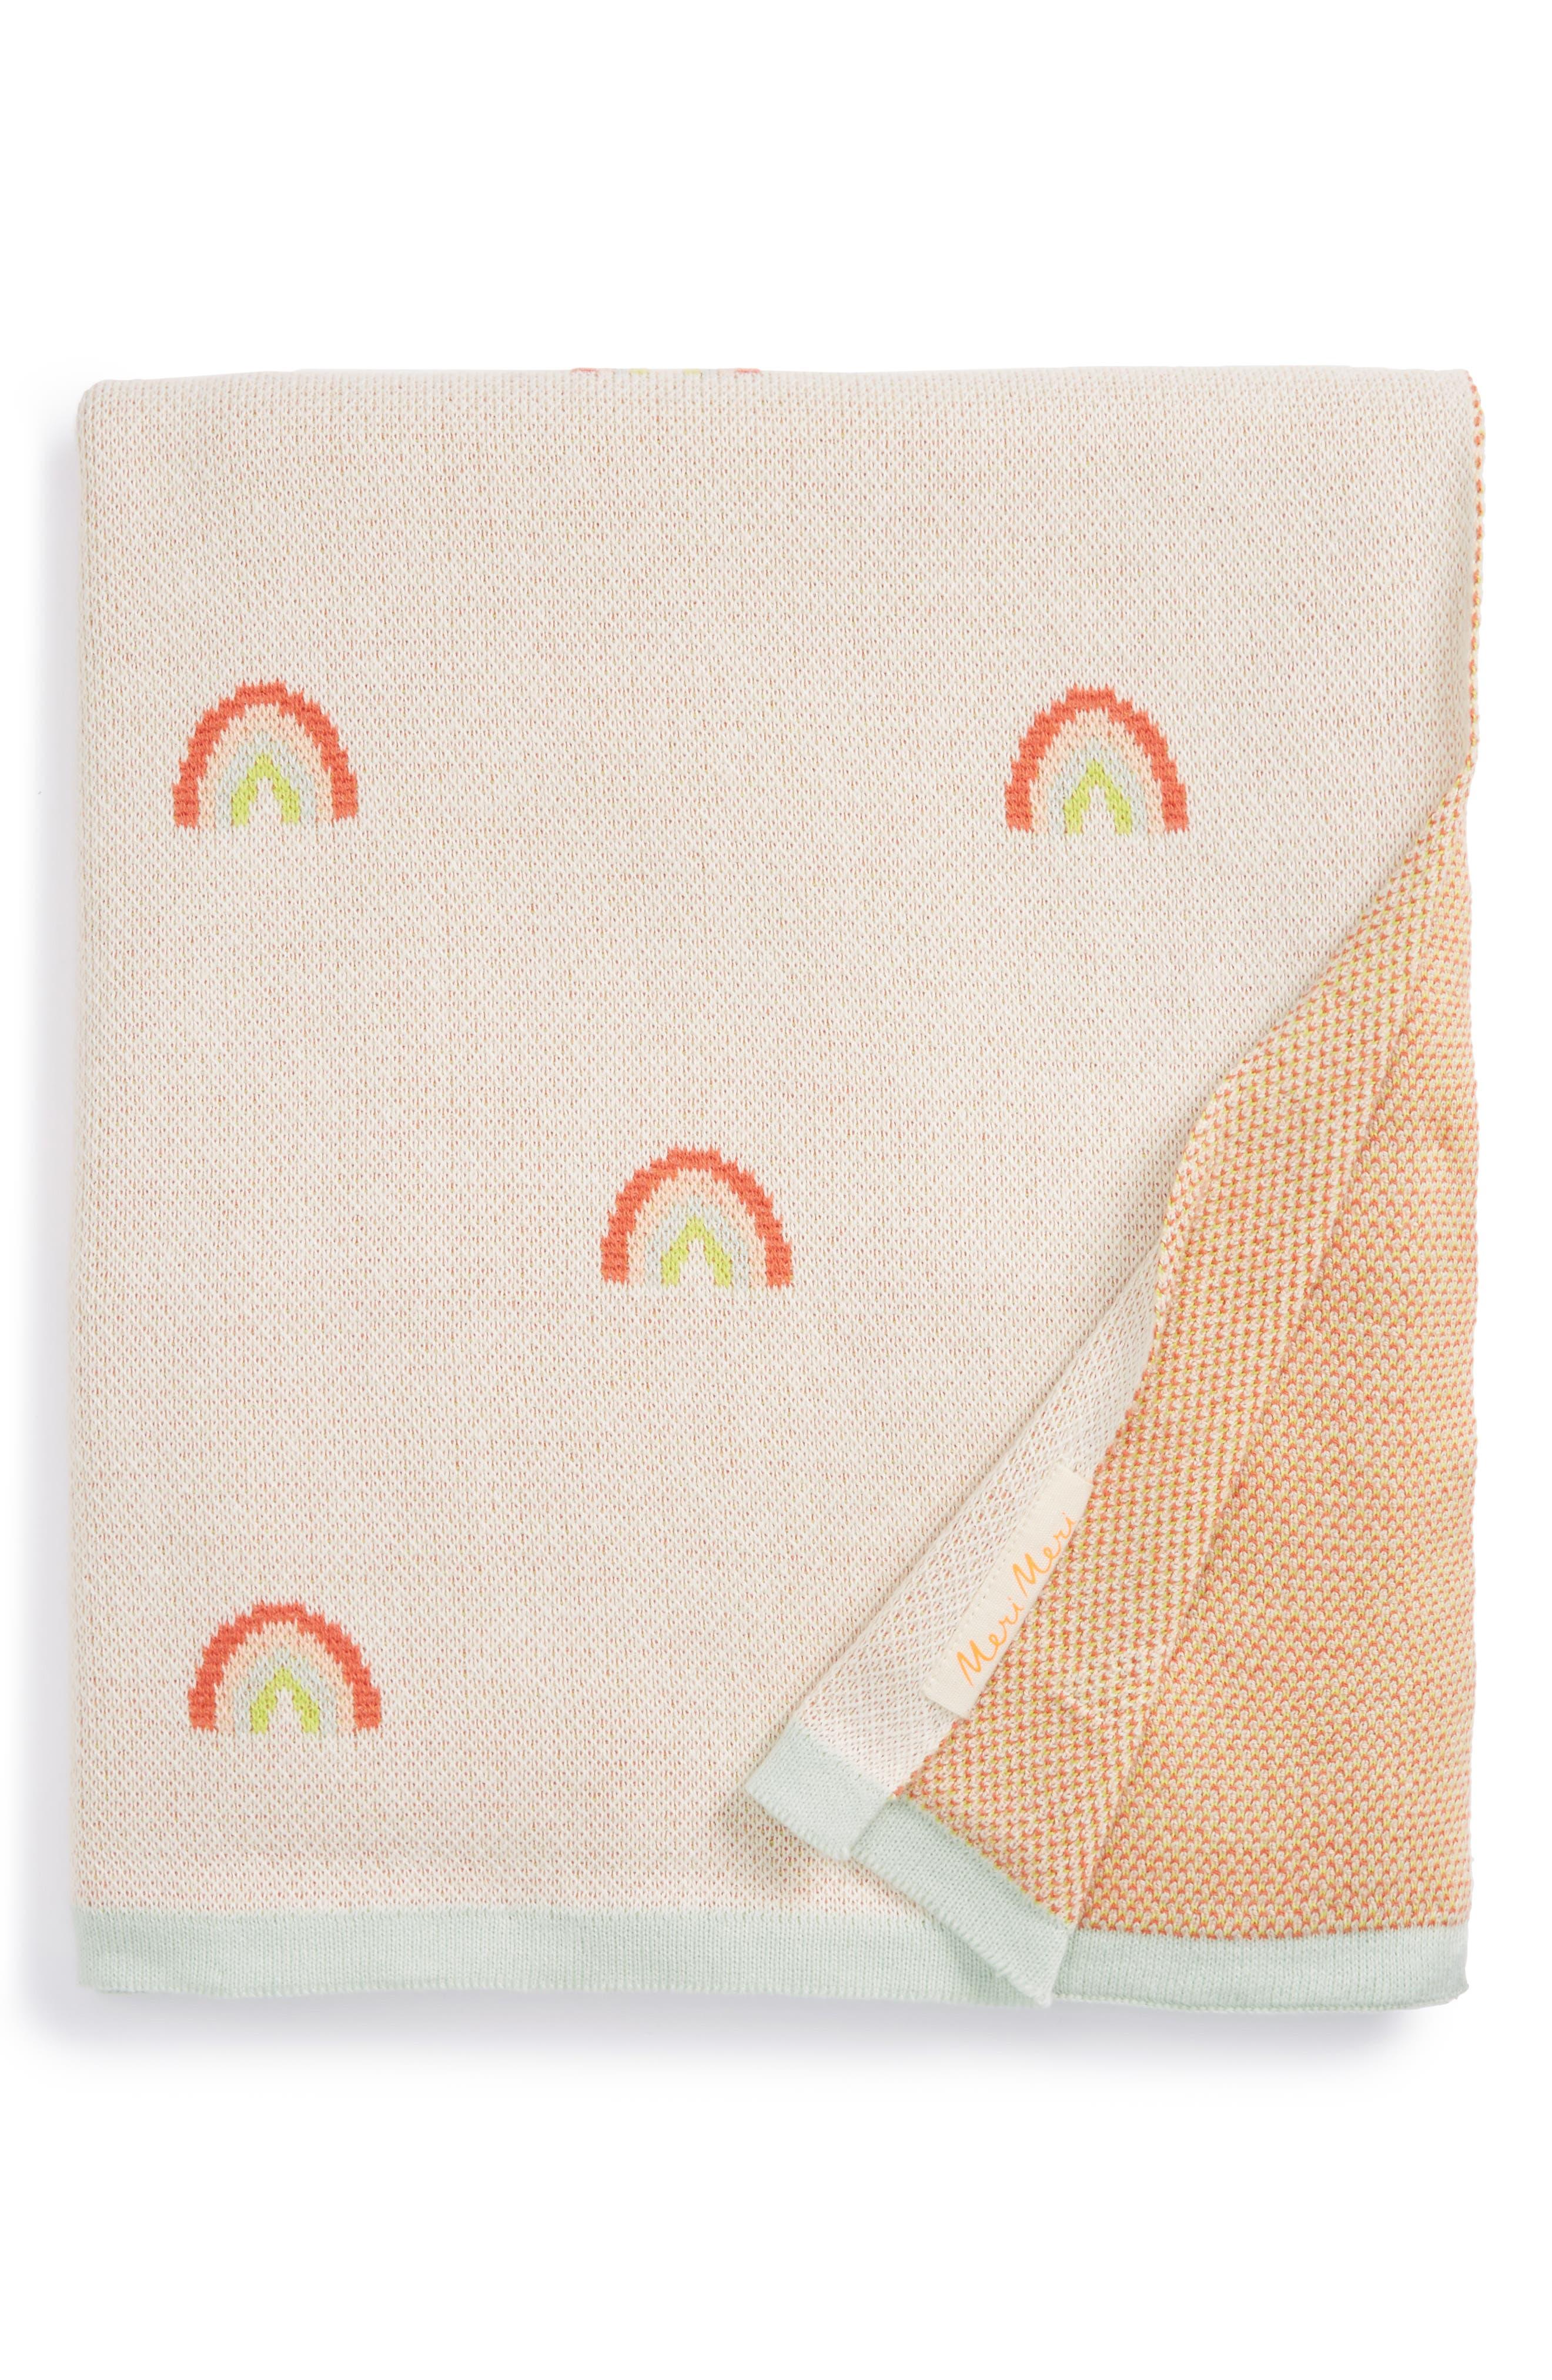 Alternate Image 1 Selected - Meri Meri Rainbow Organic Cotton Intarsia Knit Blanket